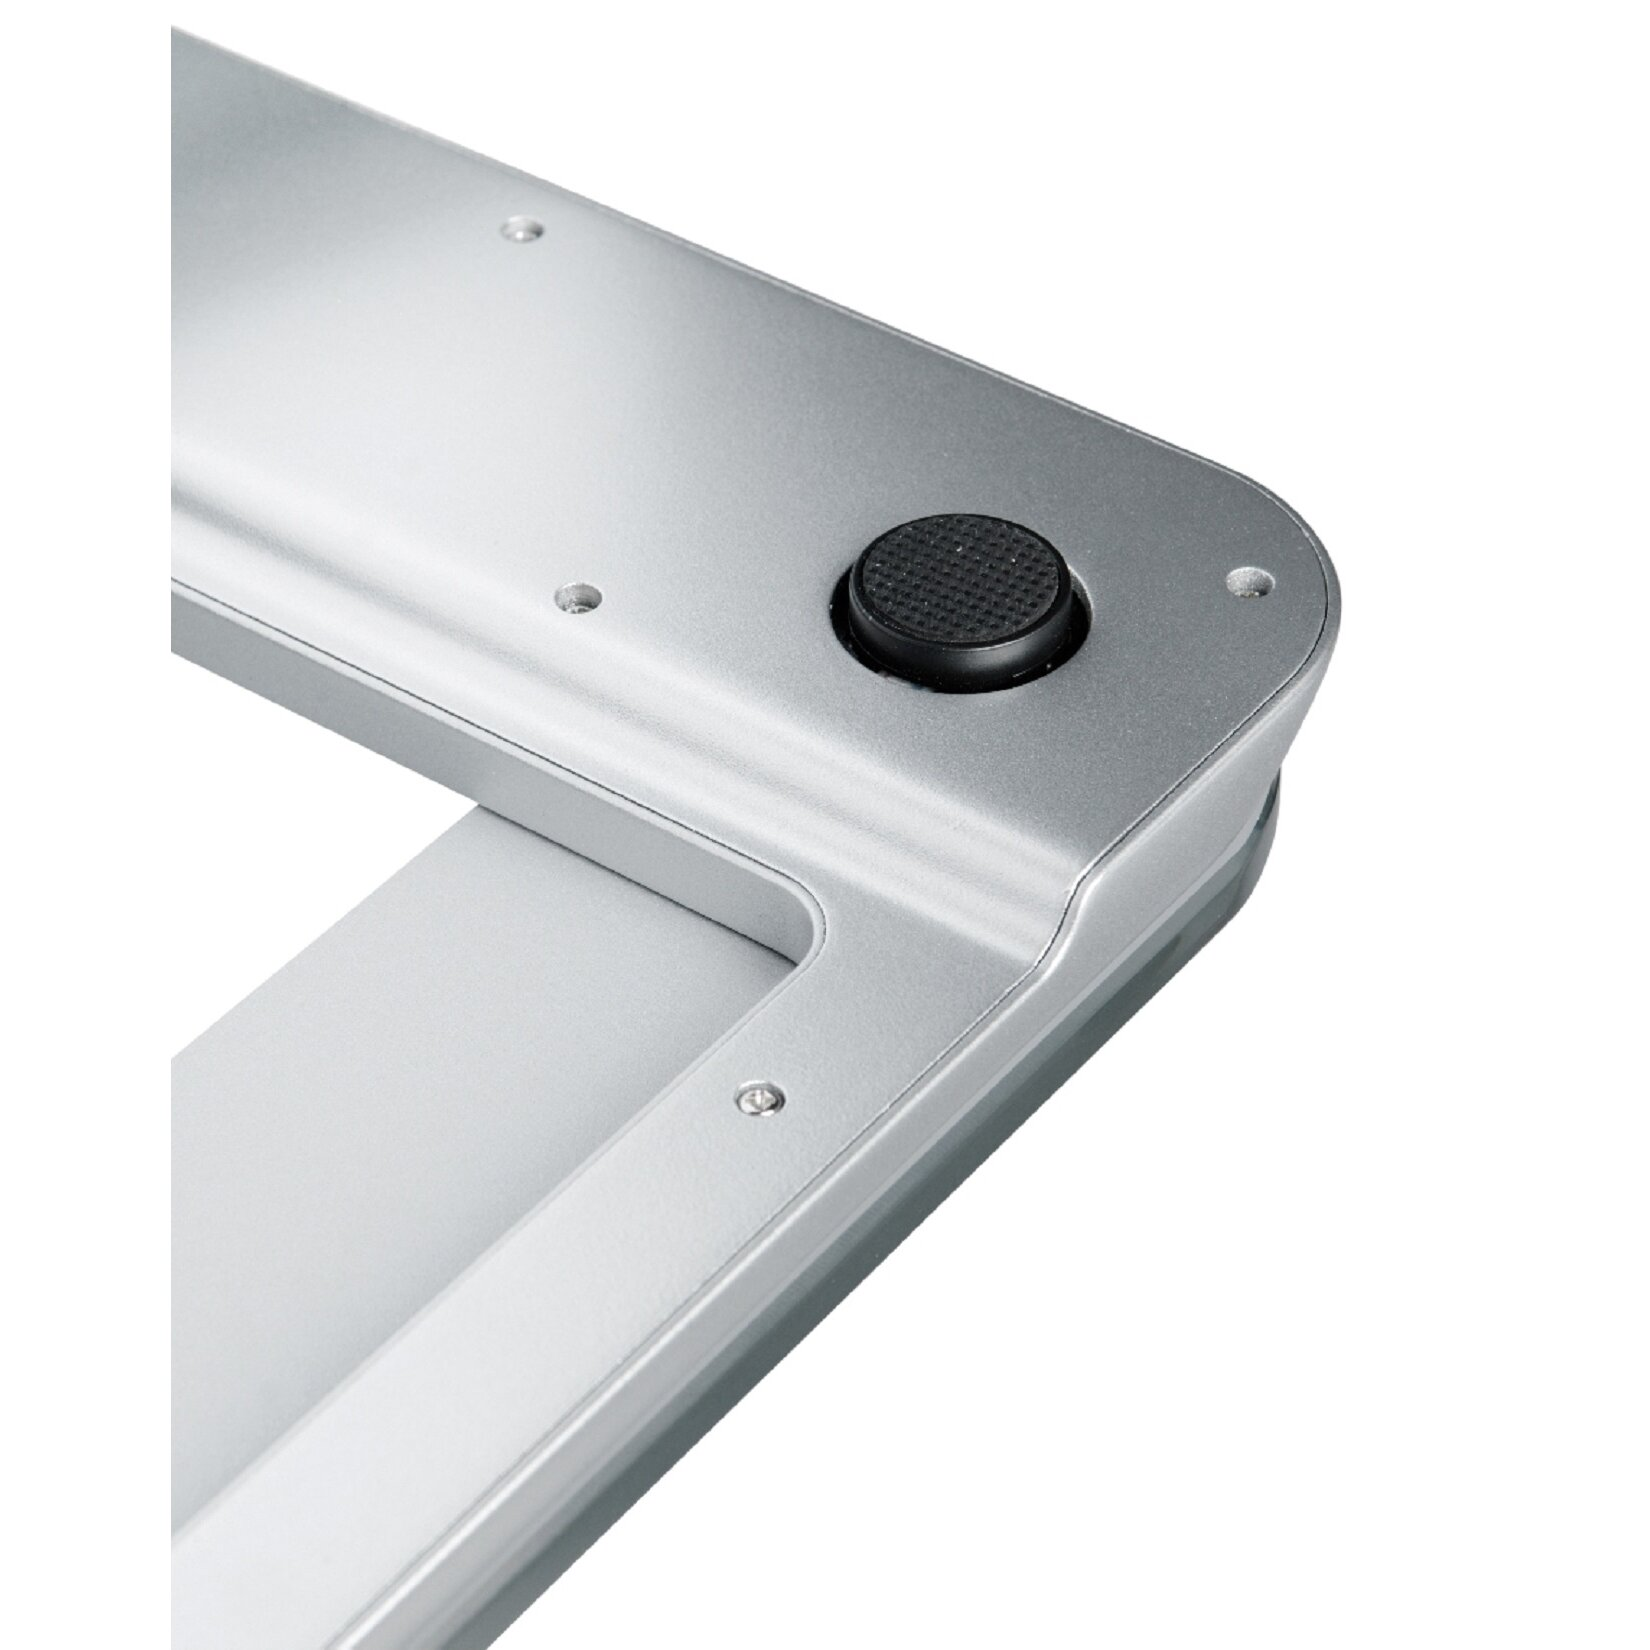 Bathroom Digital Scales: Ozeri Precision II Digital Bathroom Scale (440 Lbs